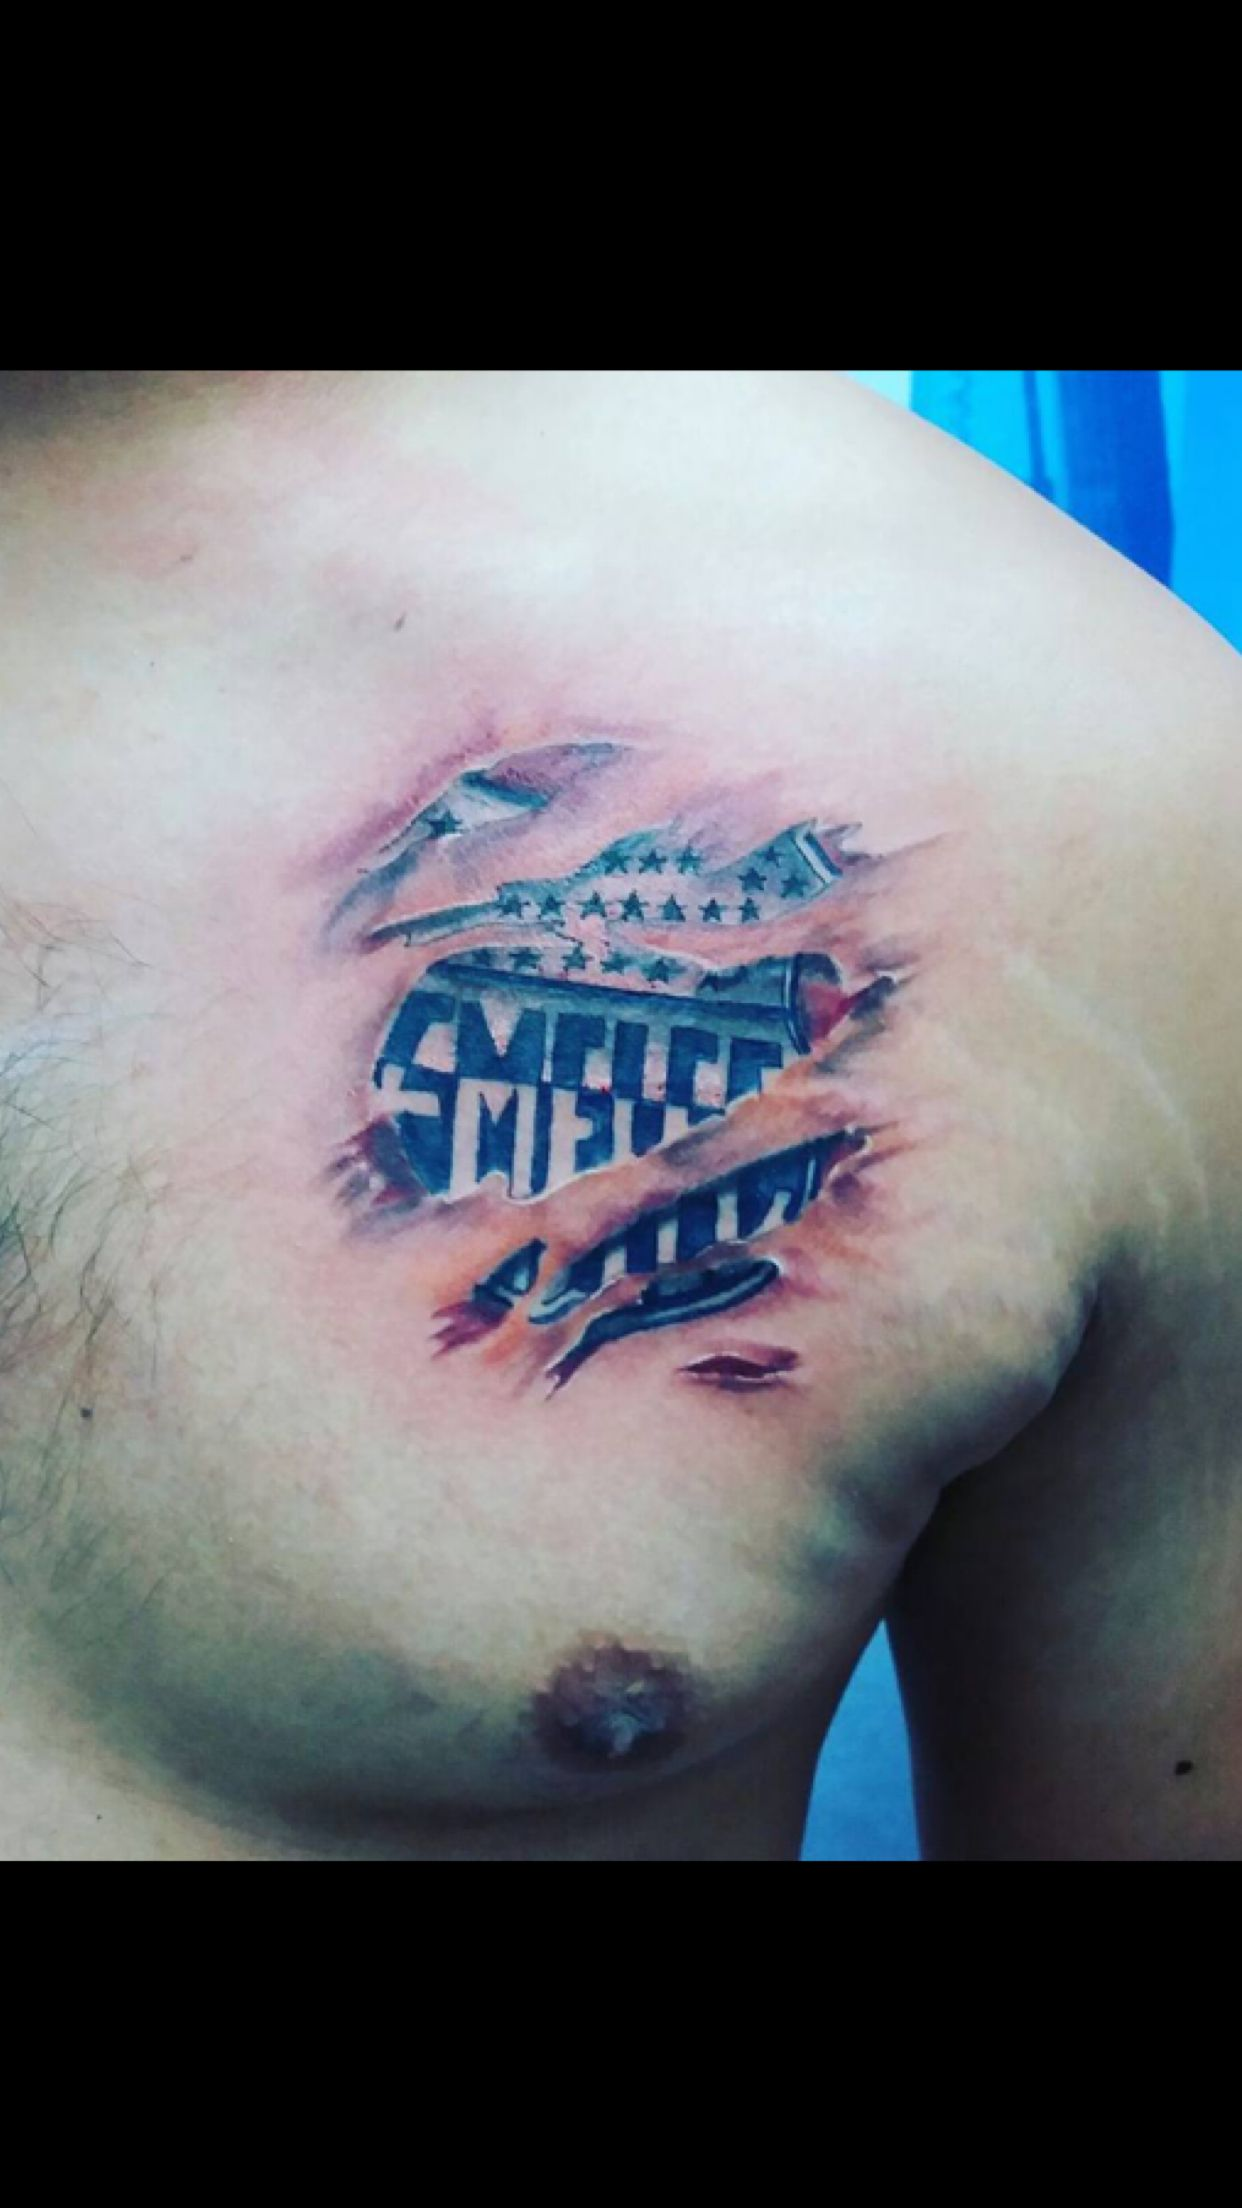 Emelec Tattoo